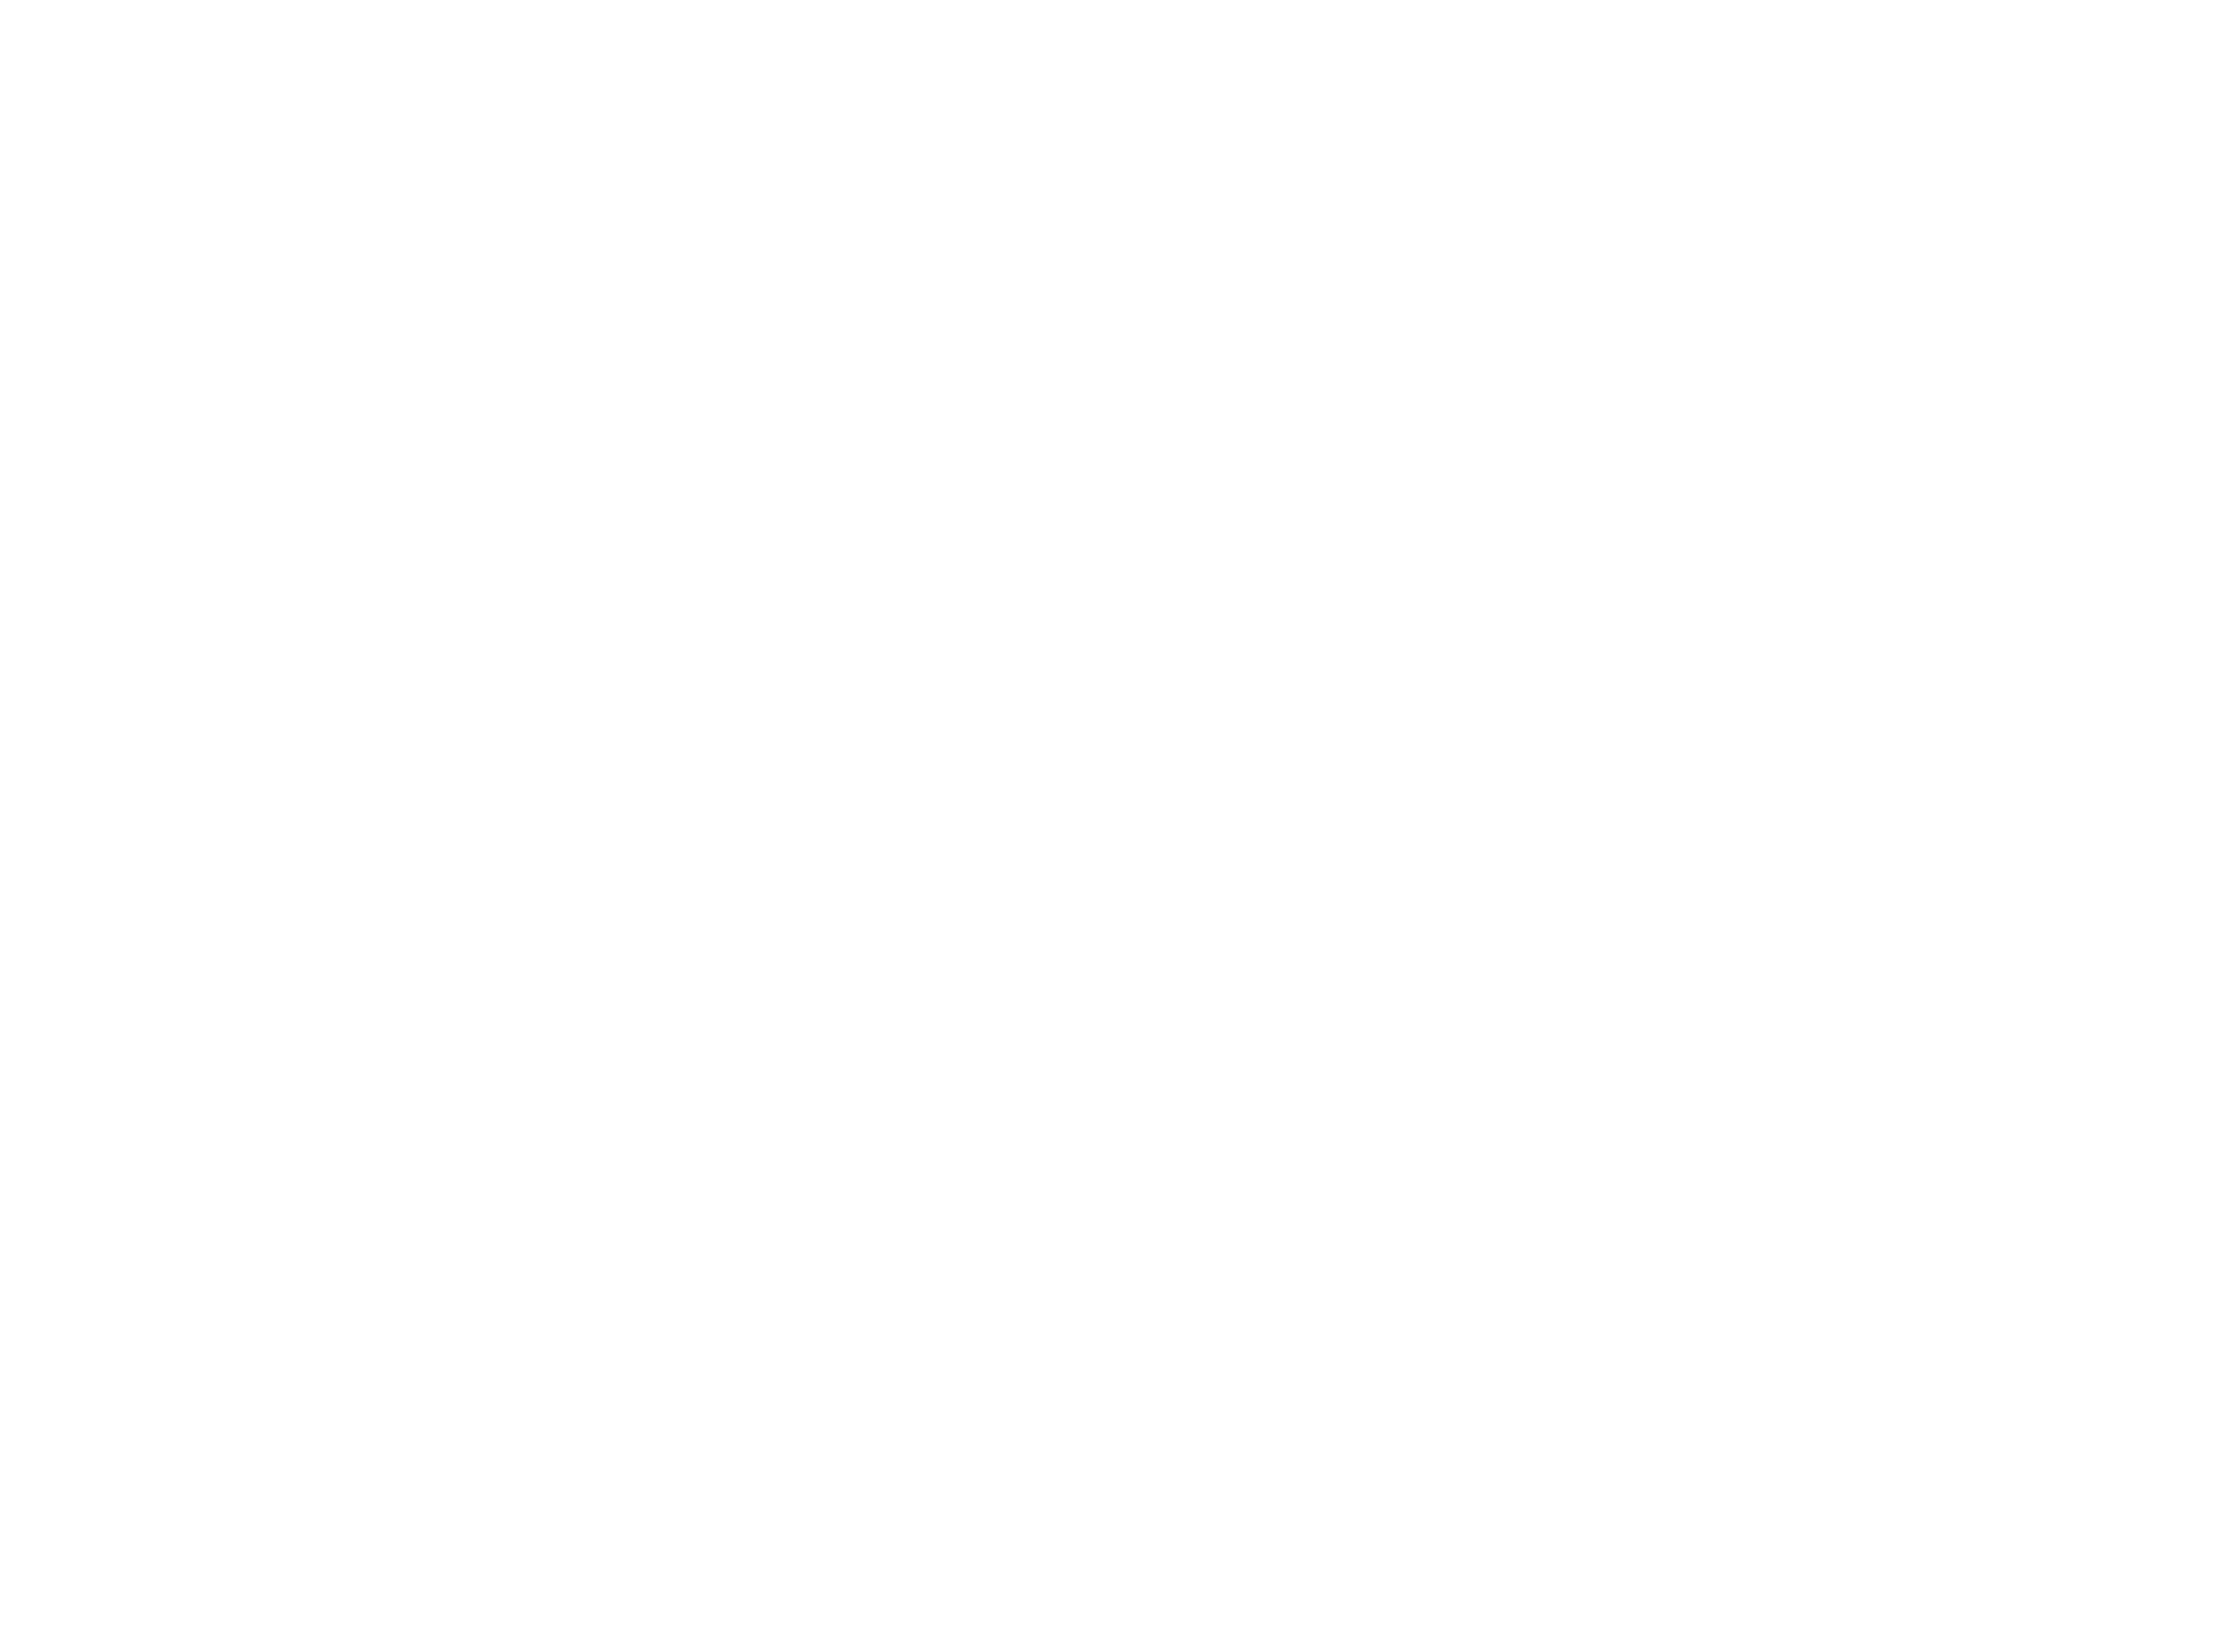 icone-03